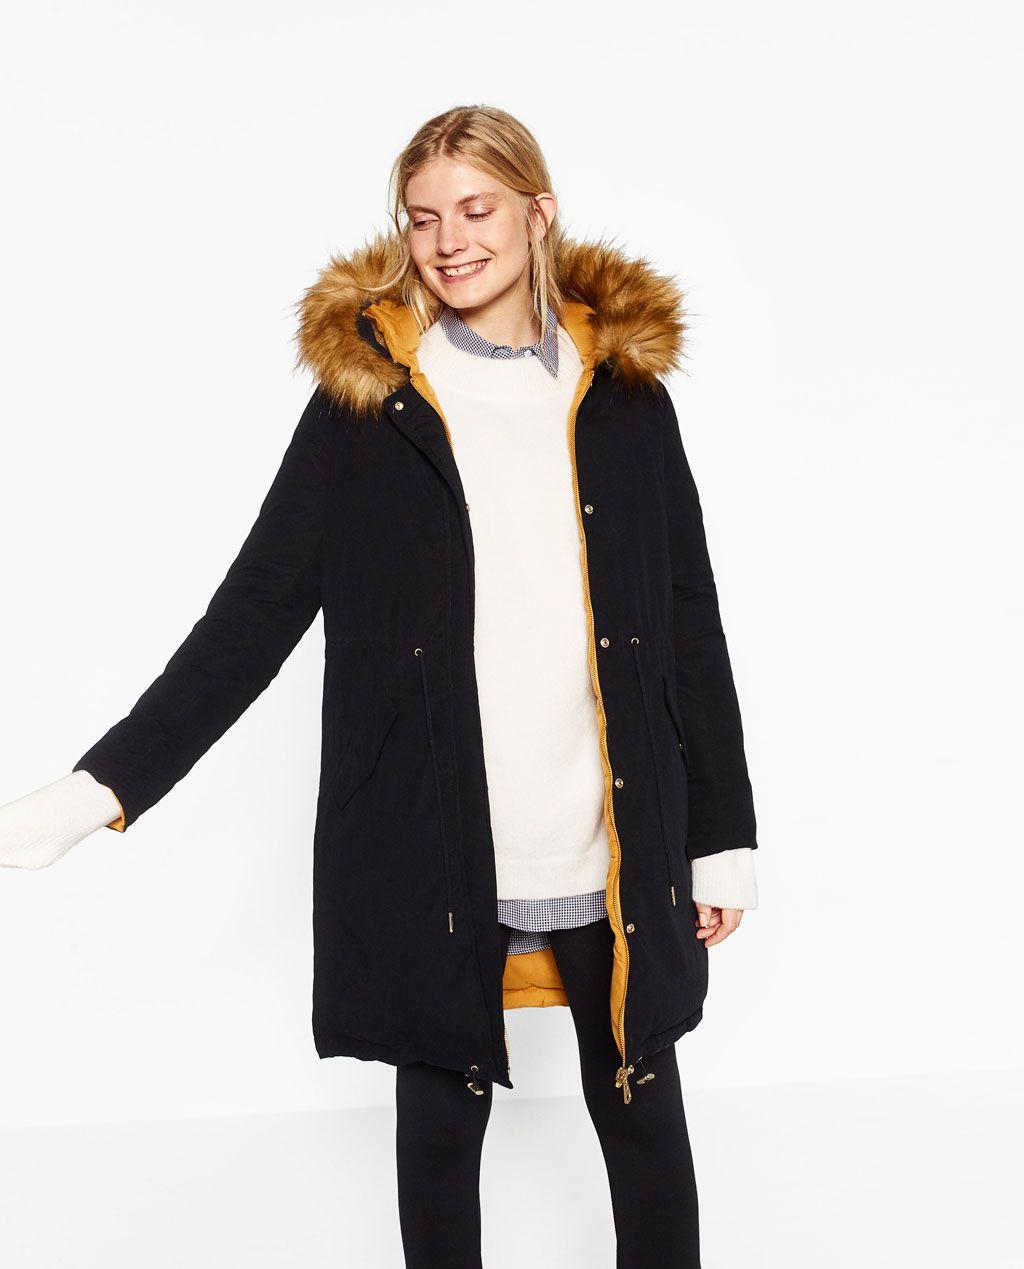 Outerwear Zara Reversible Anorak Coats Zara Y Mujer Women q44UwHnP